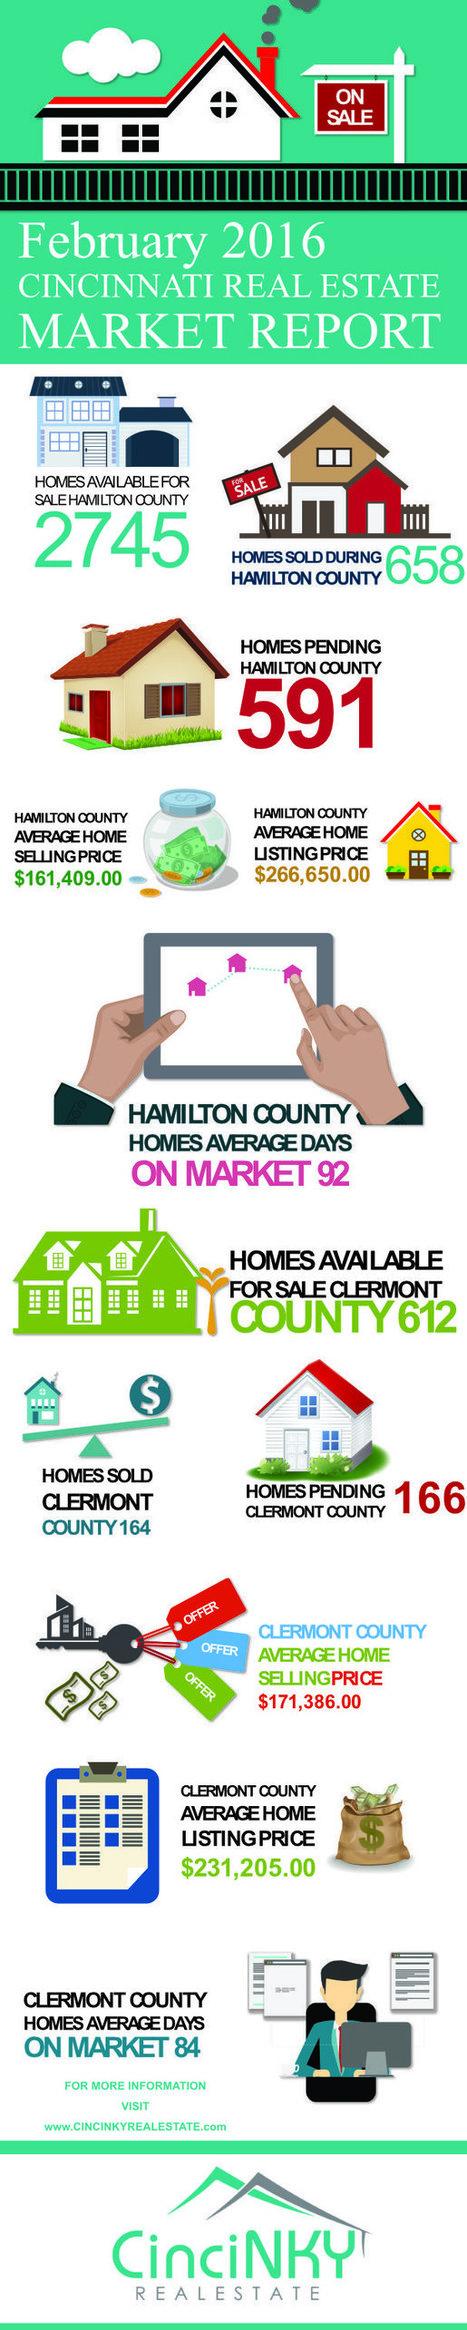 February 2016 Greater Cincinnati Real Estate Market Report - Cincinnati and Northern Kentucky Real Estate   Real Estate   Scoop.it